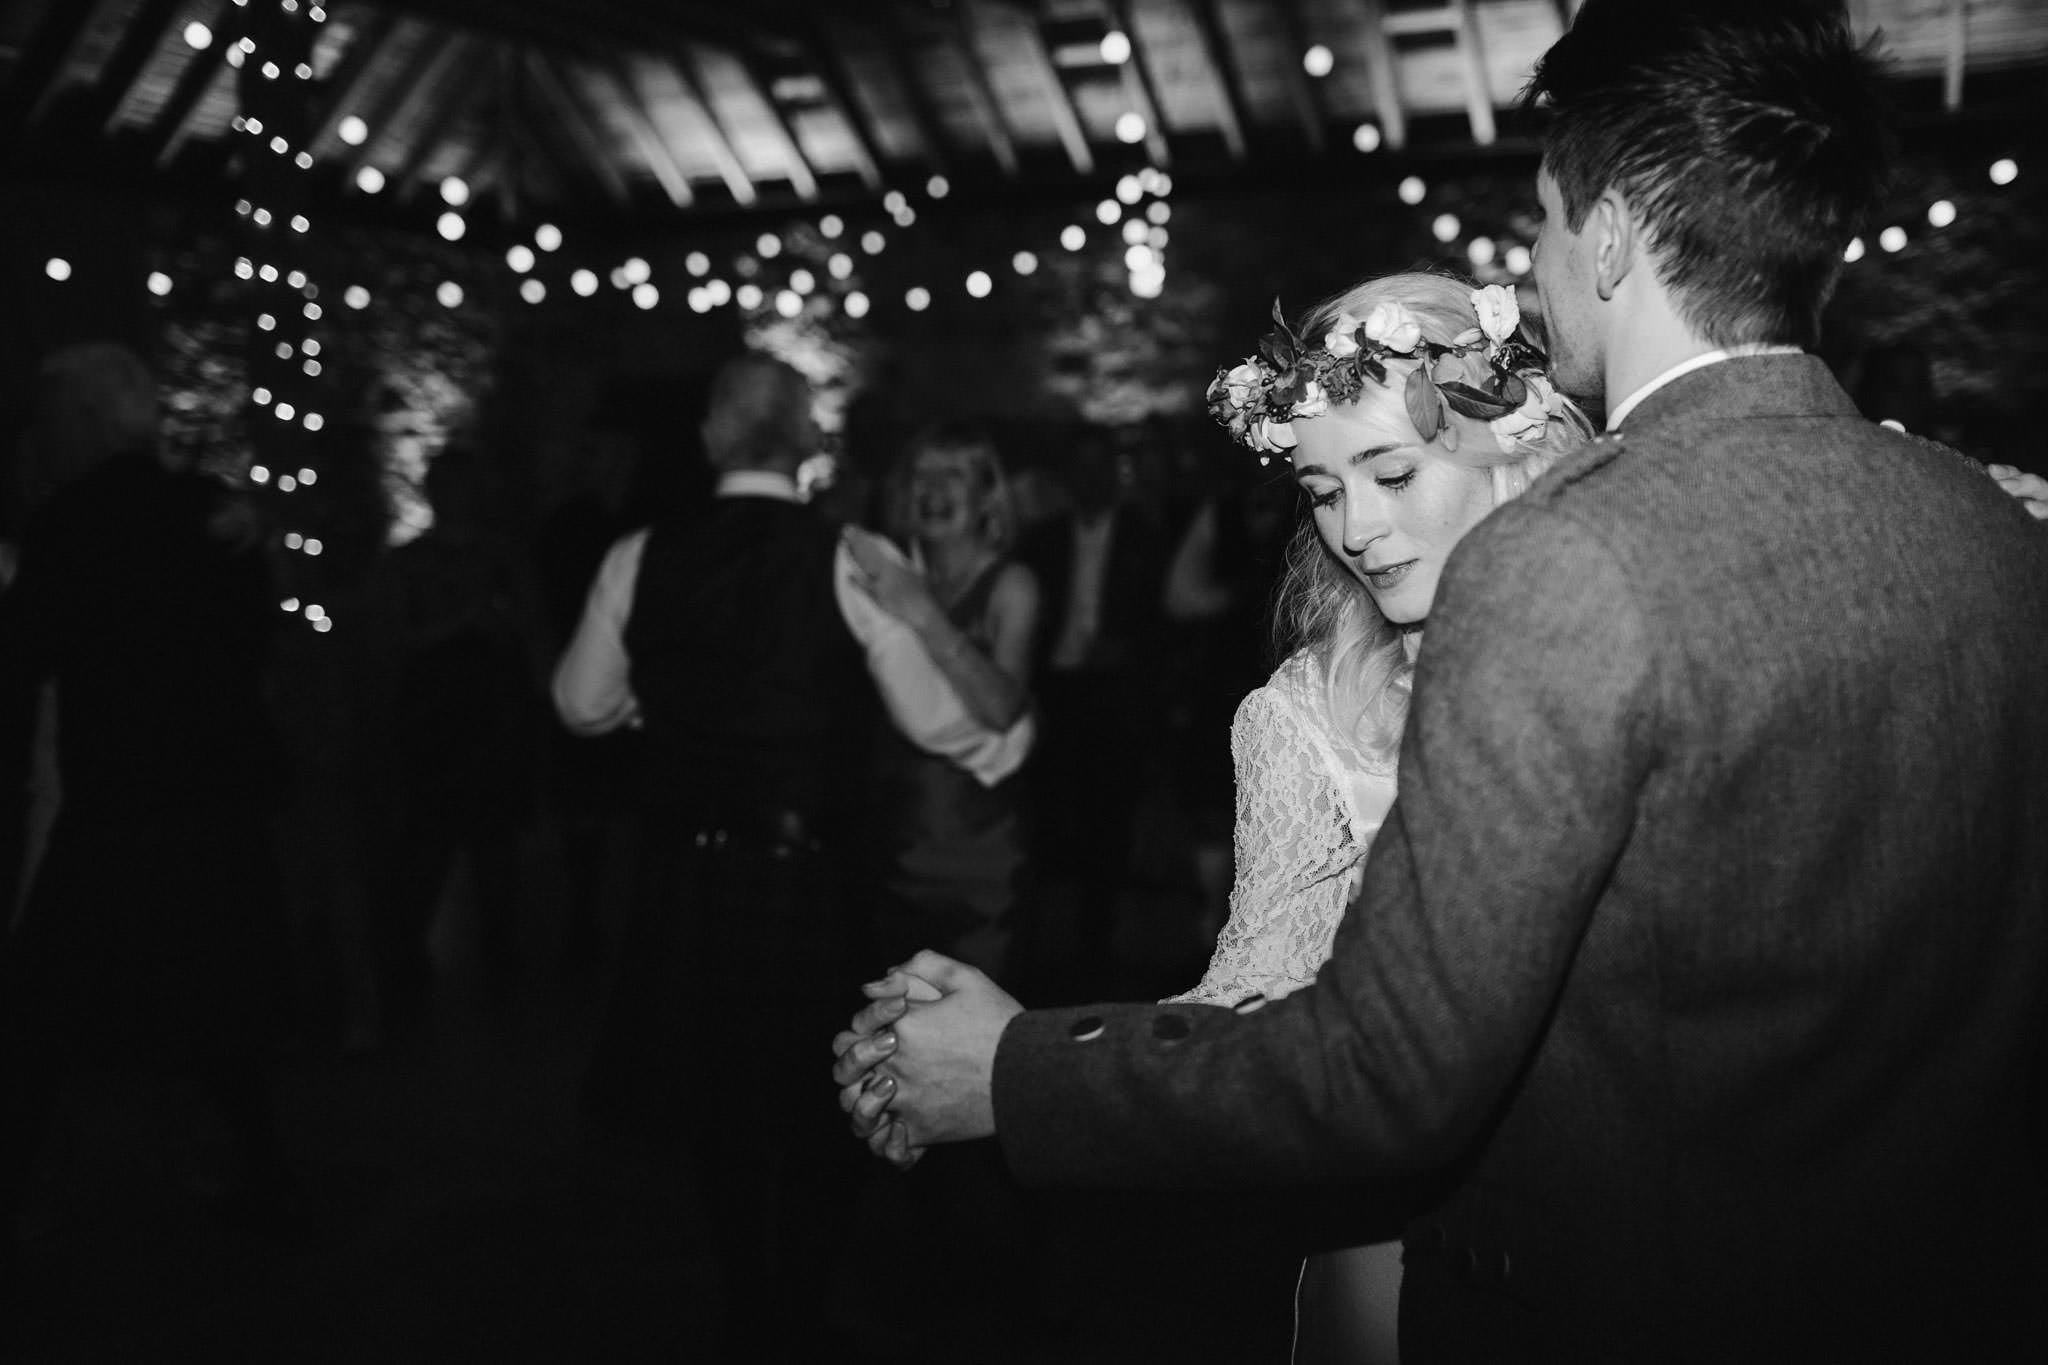 wedding-photography-scotland-106